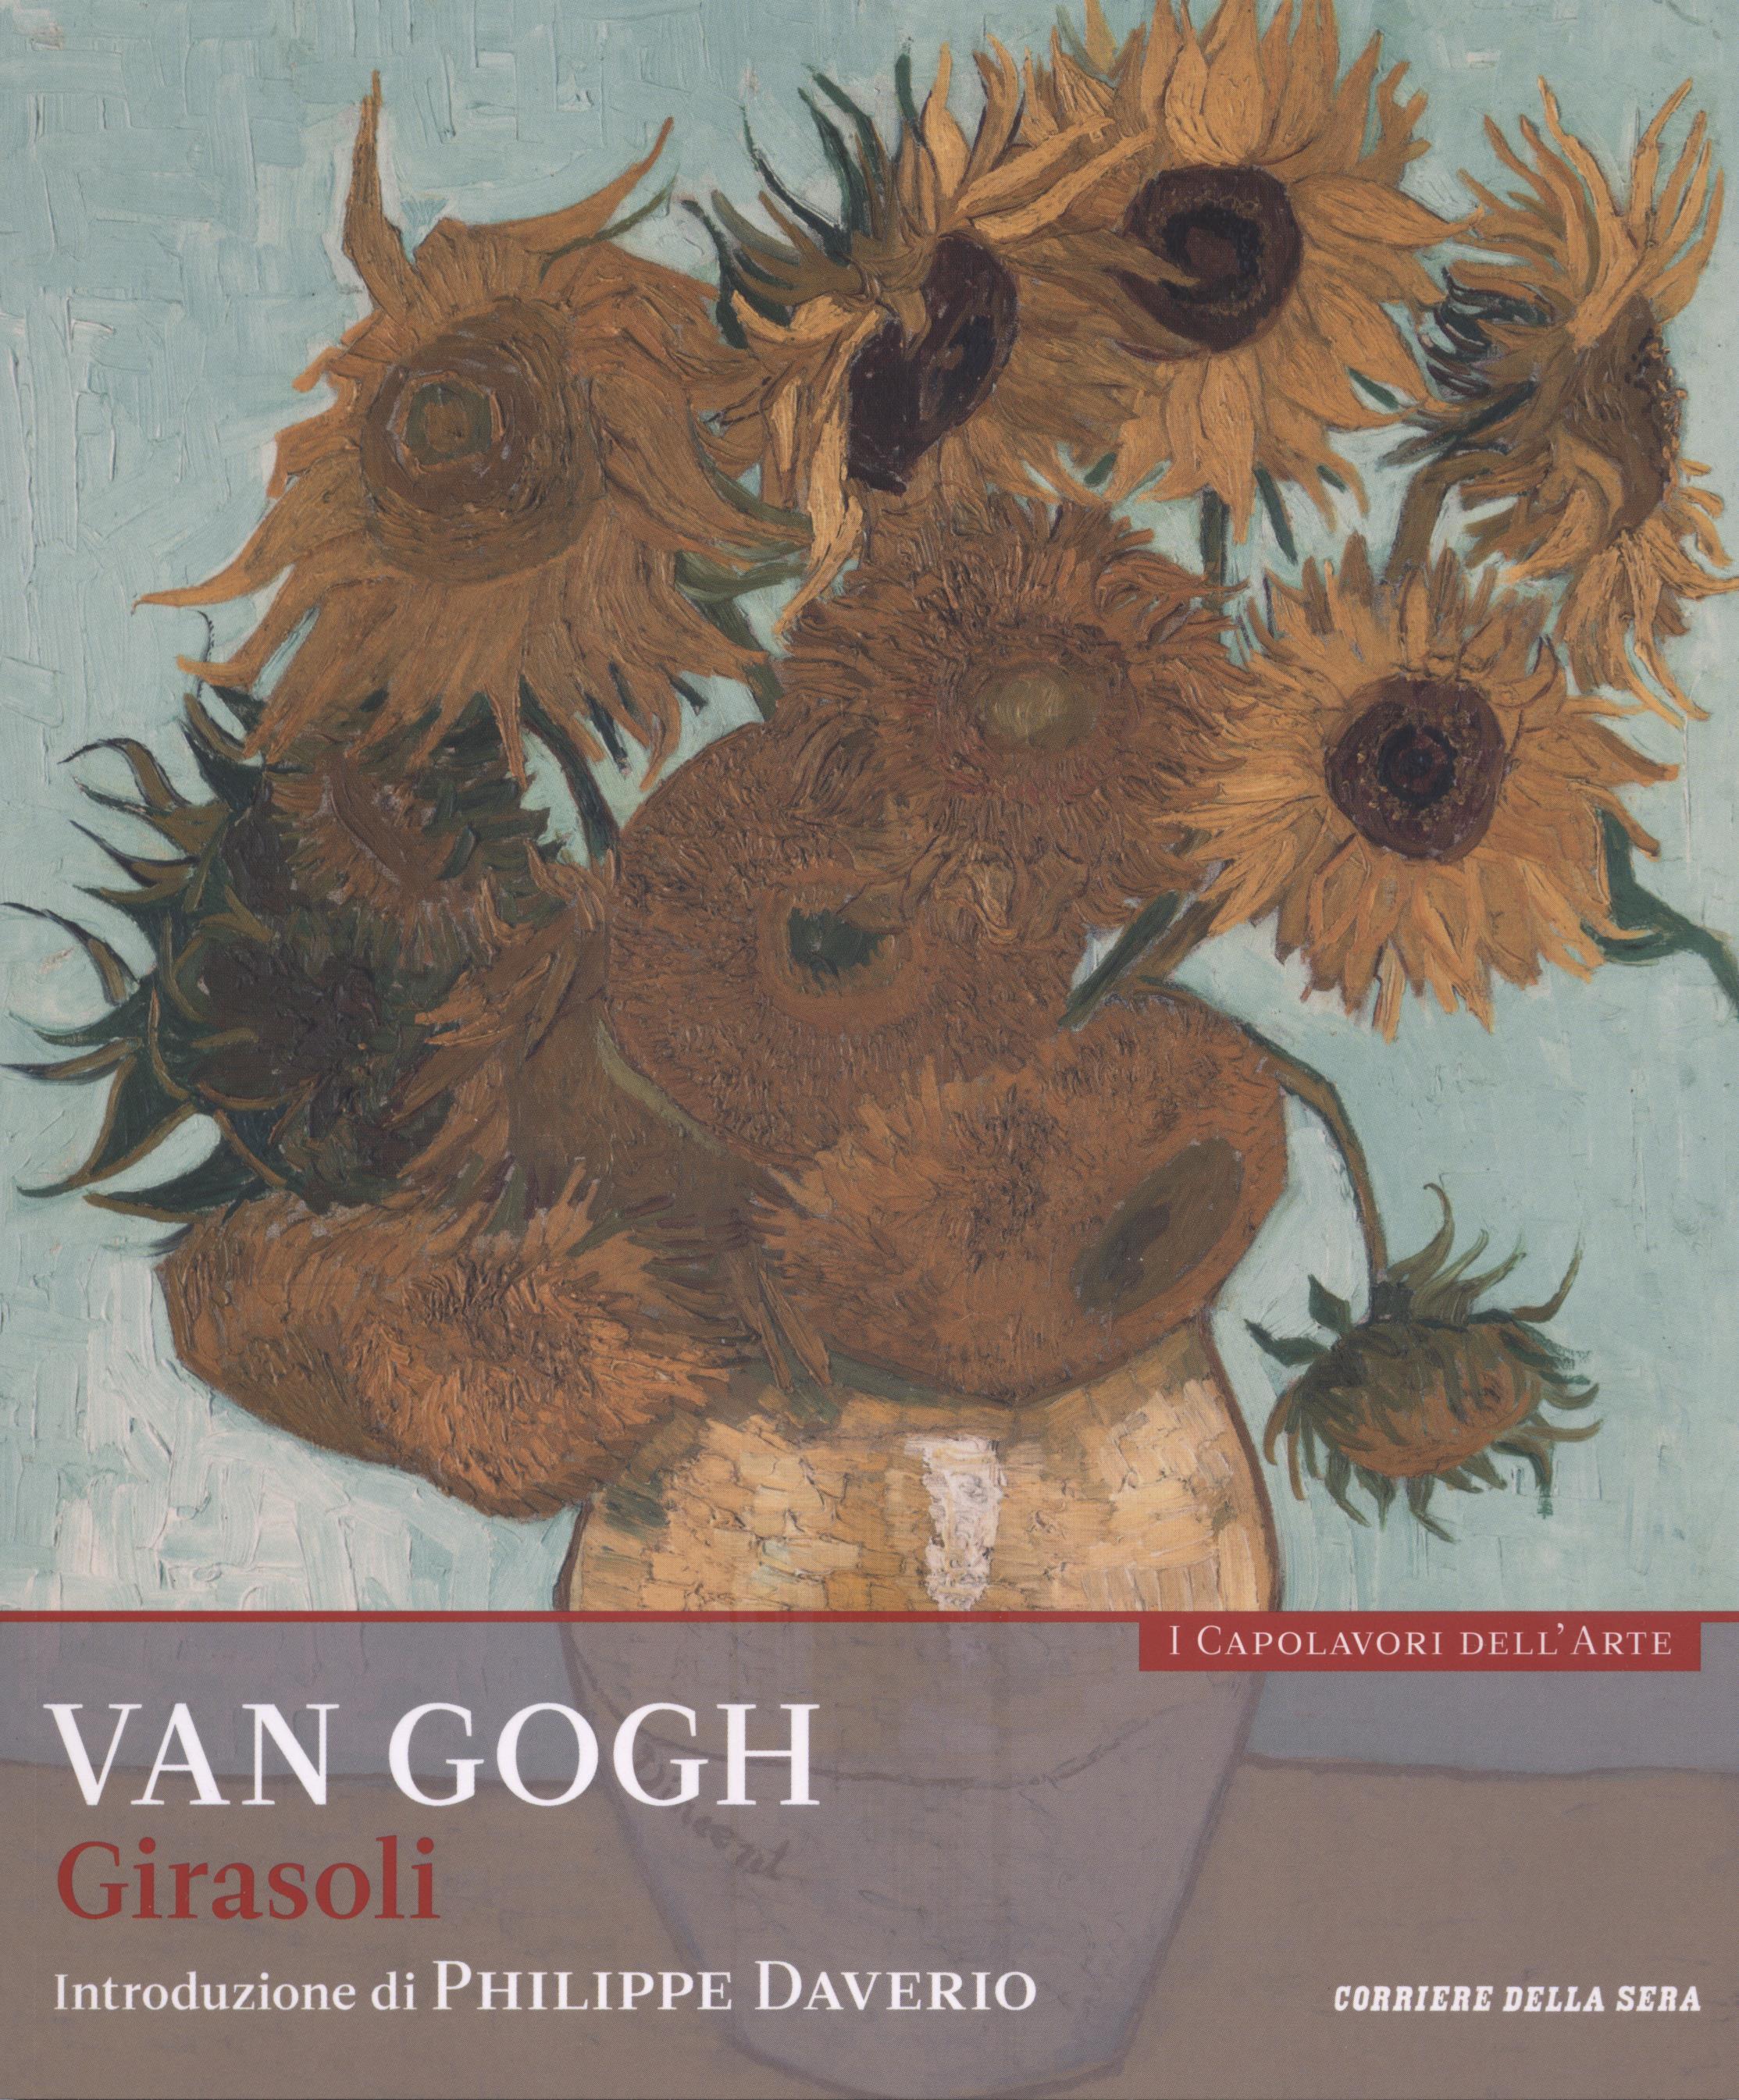 Van Gogh - Girasoli